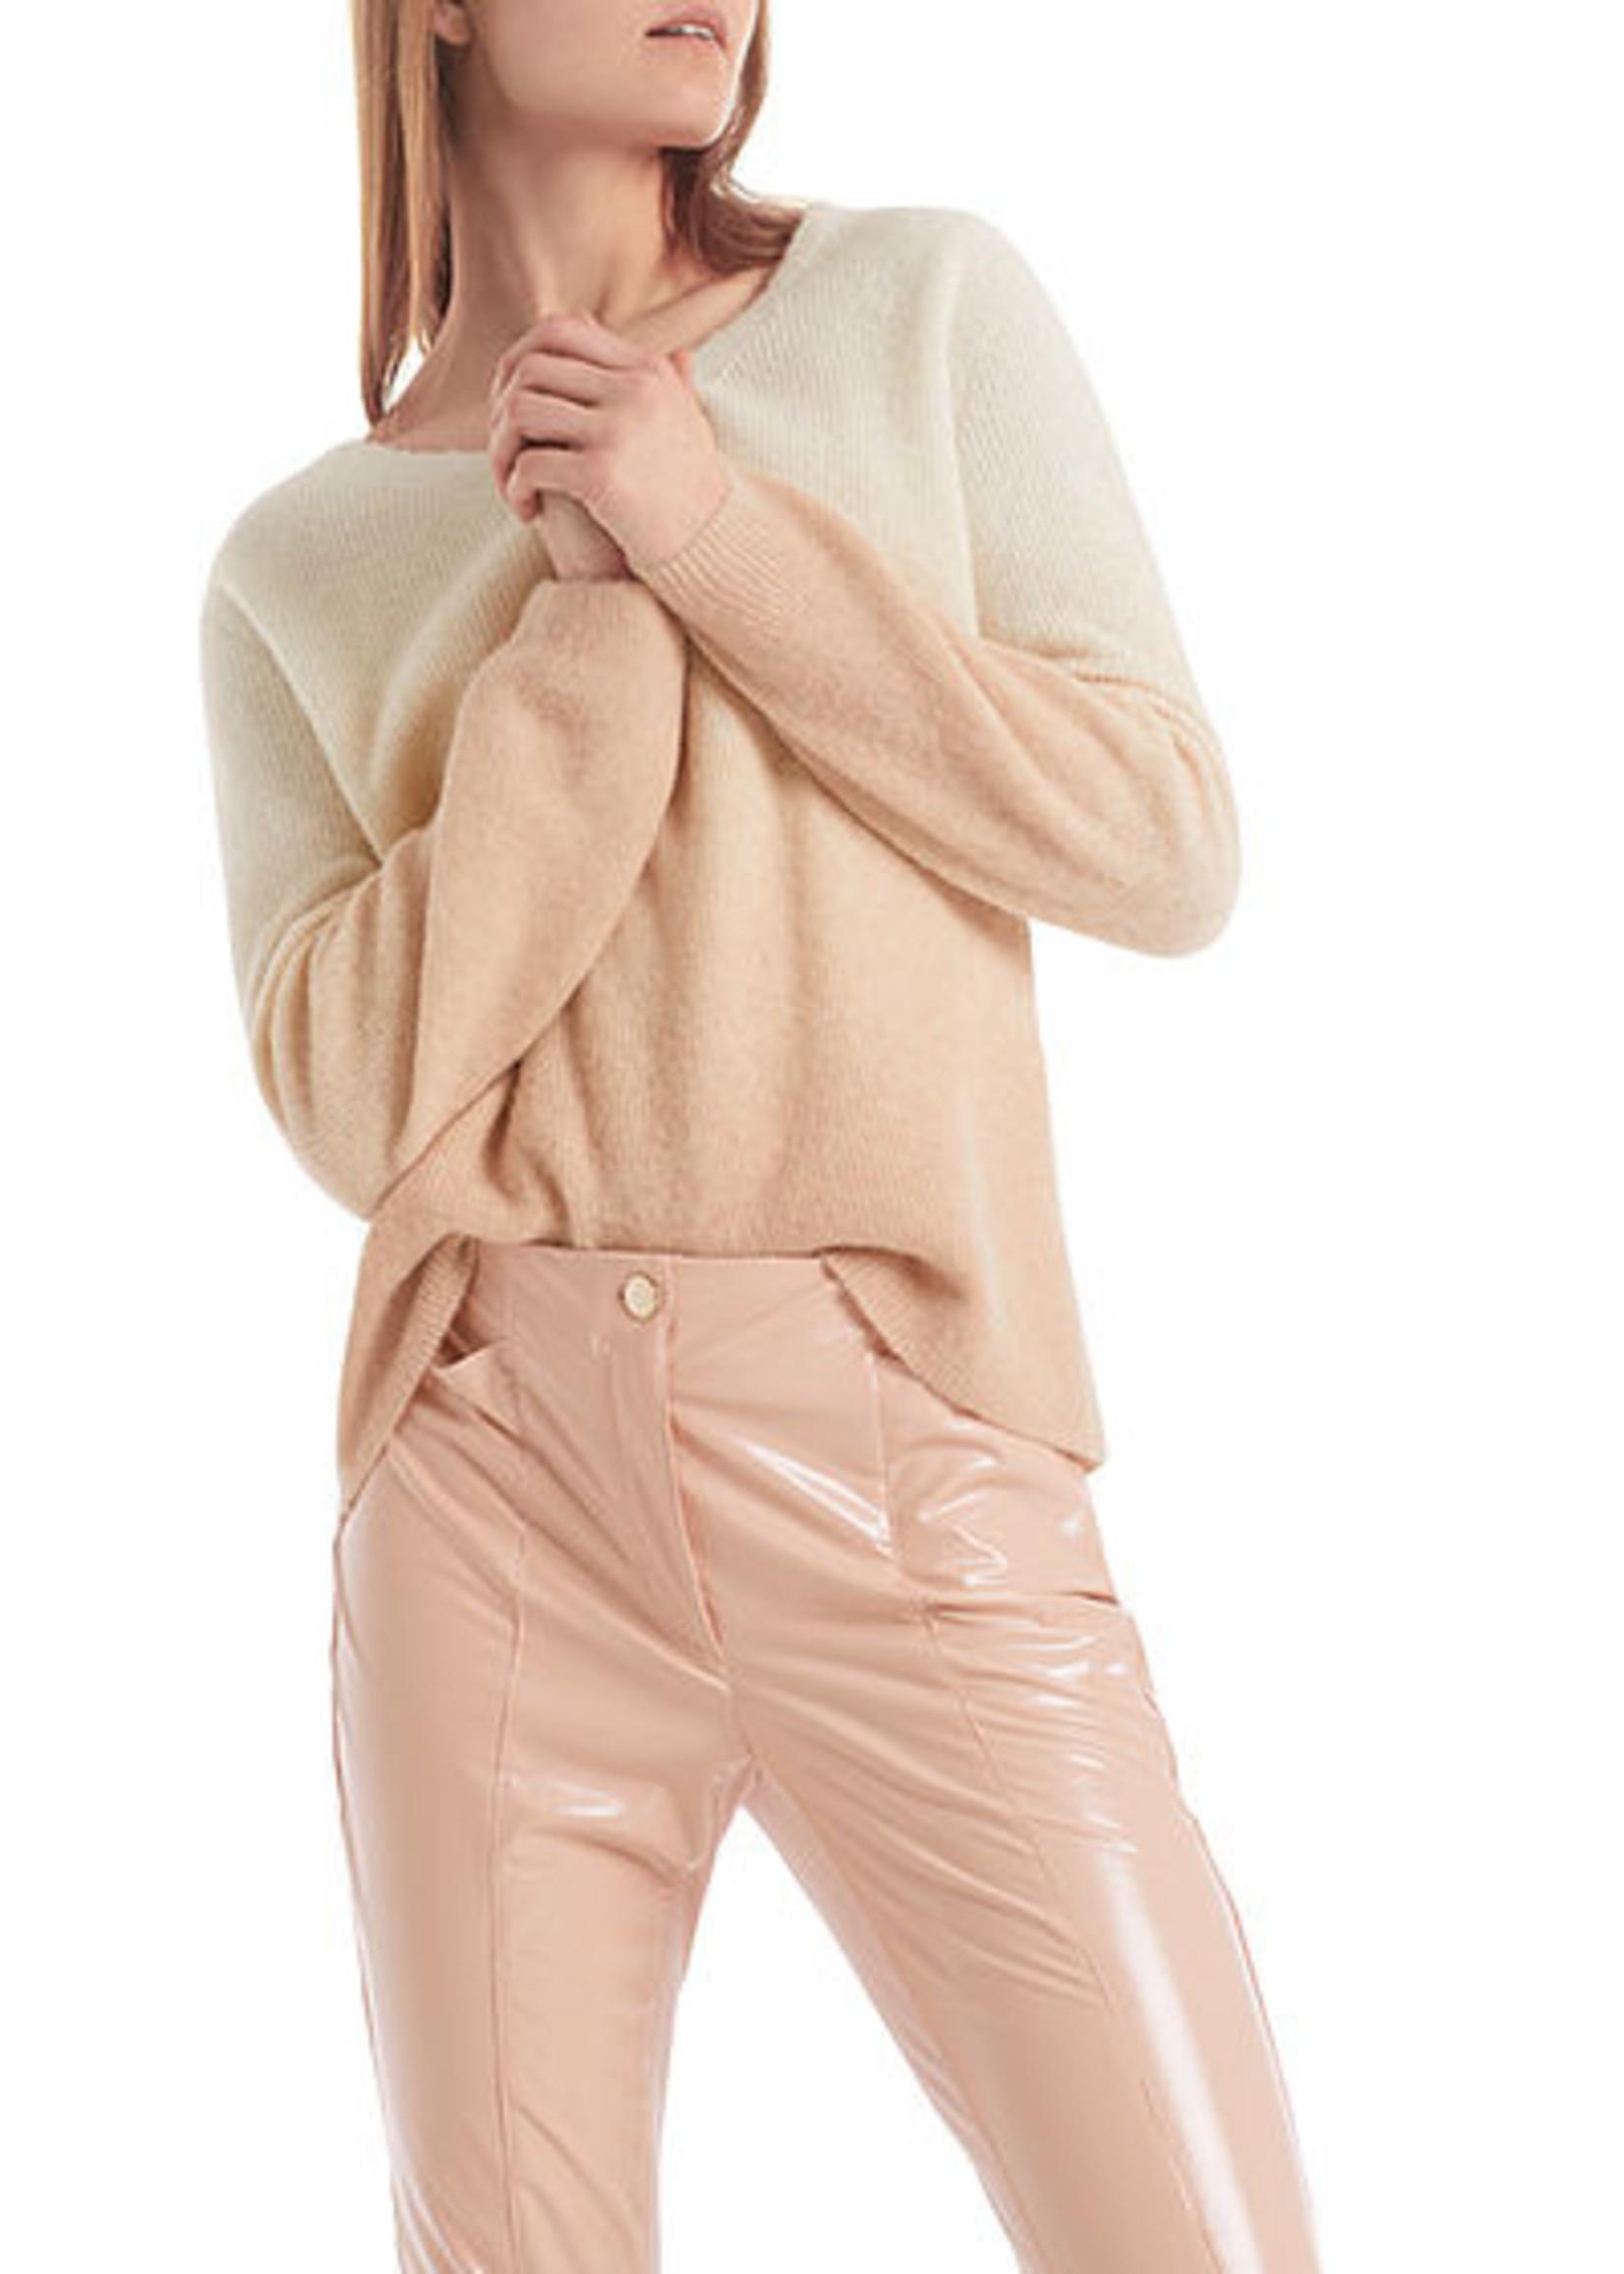 Sweater RC 41.11 M72 sandy beige